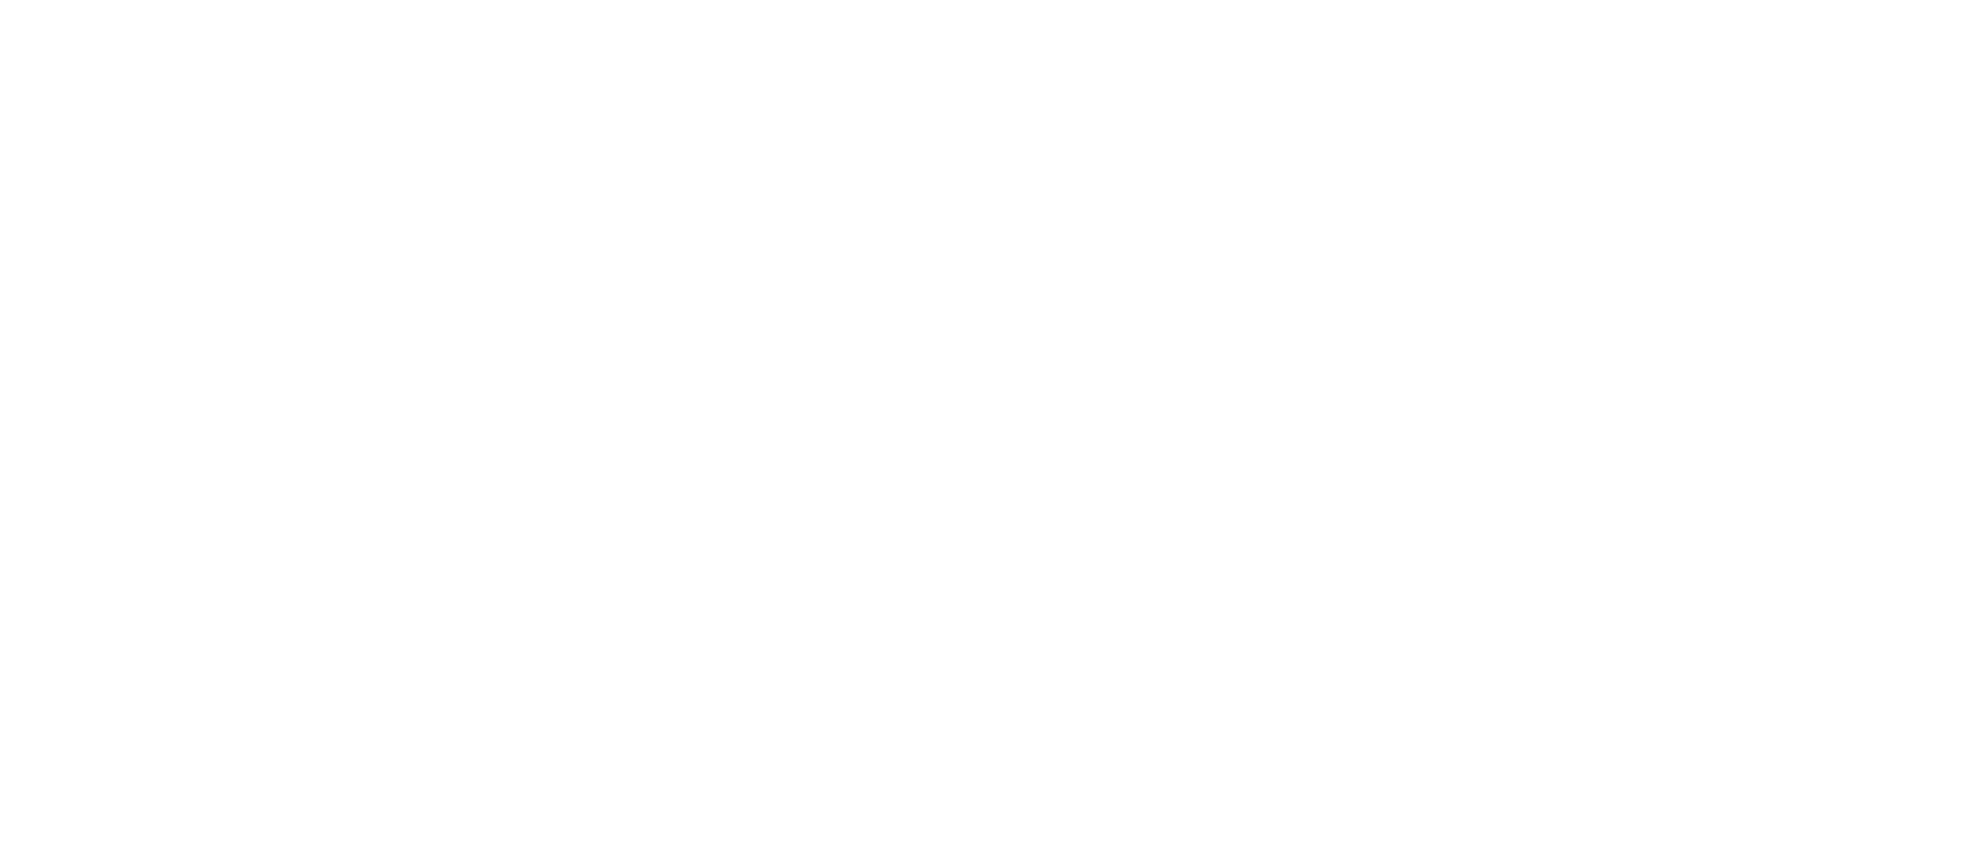 Clone of Future Forward: Investor Education - Register your interest